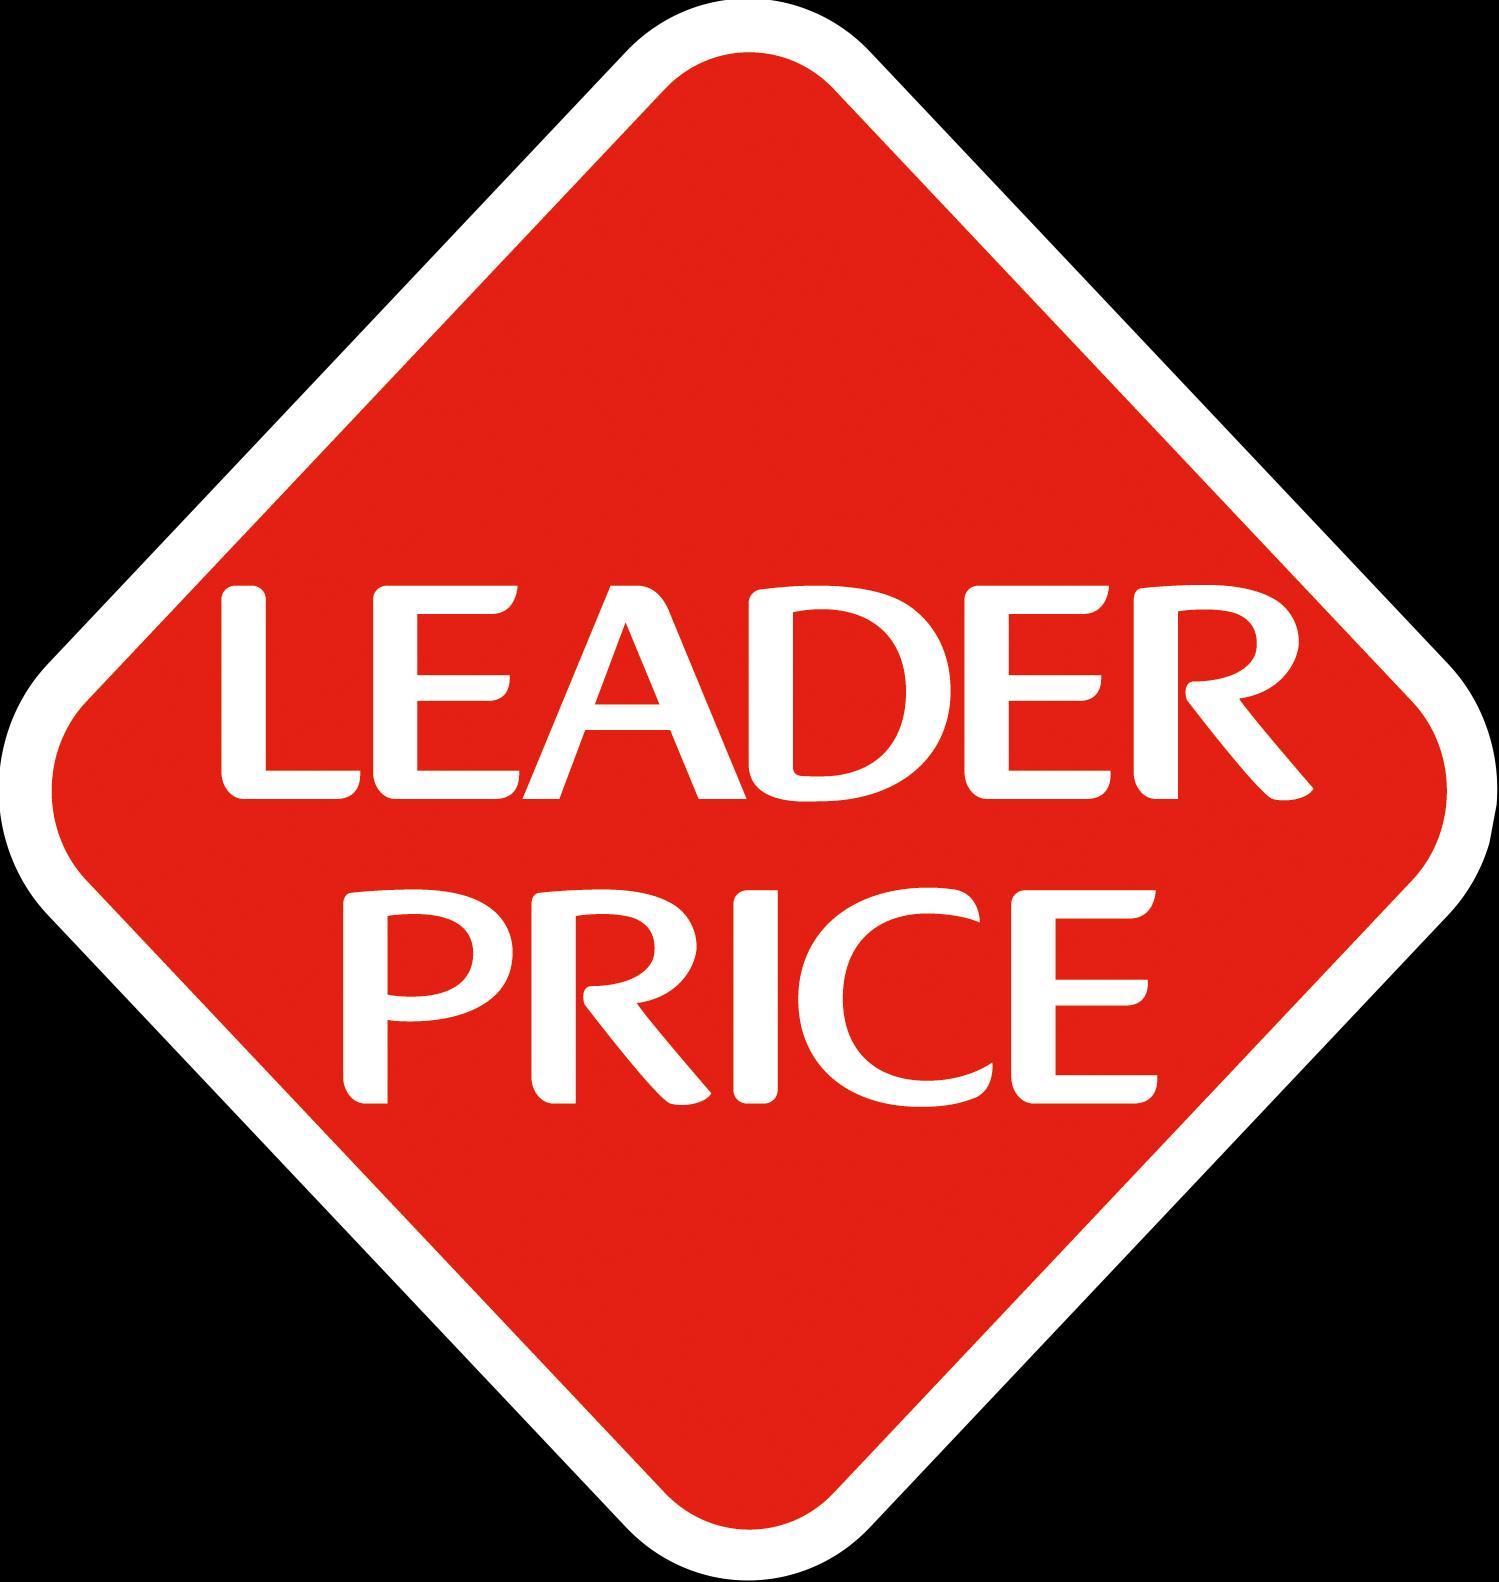 Leader Price Saint Joseph